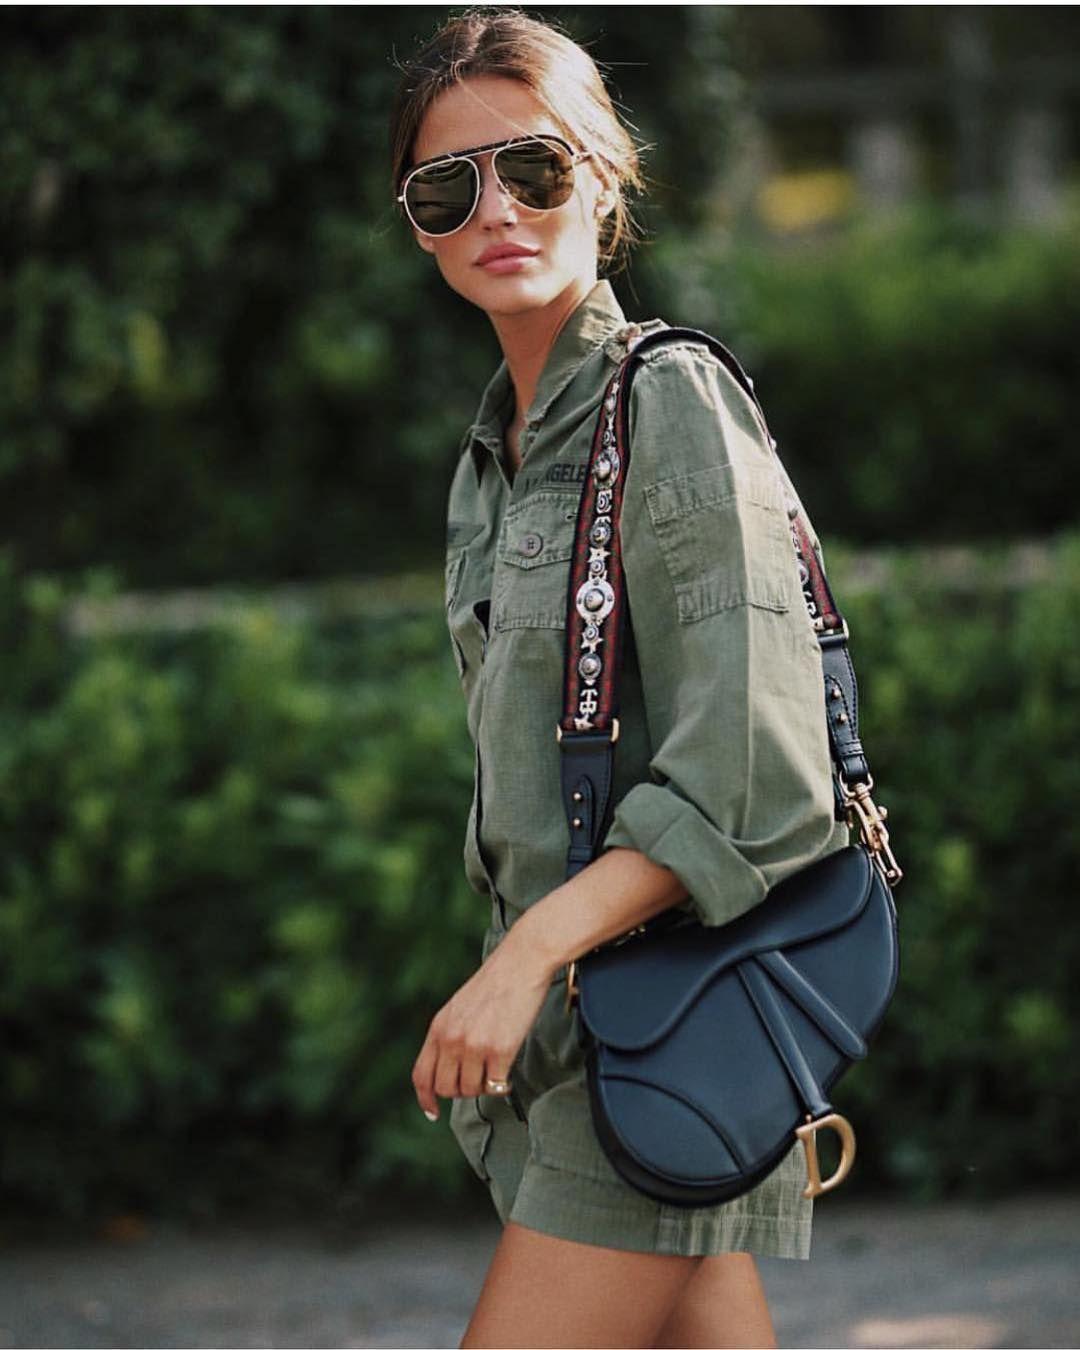 Top 5 Fashionable Handbags 2021 Worth Investing